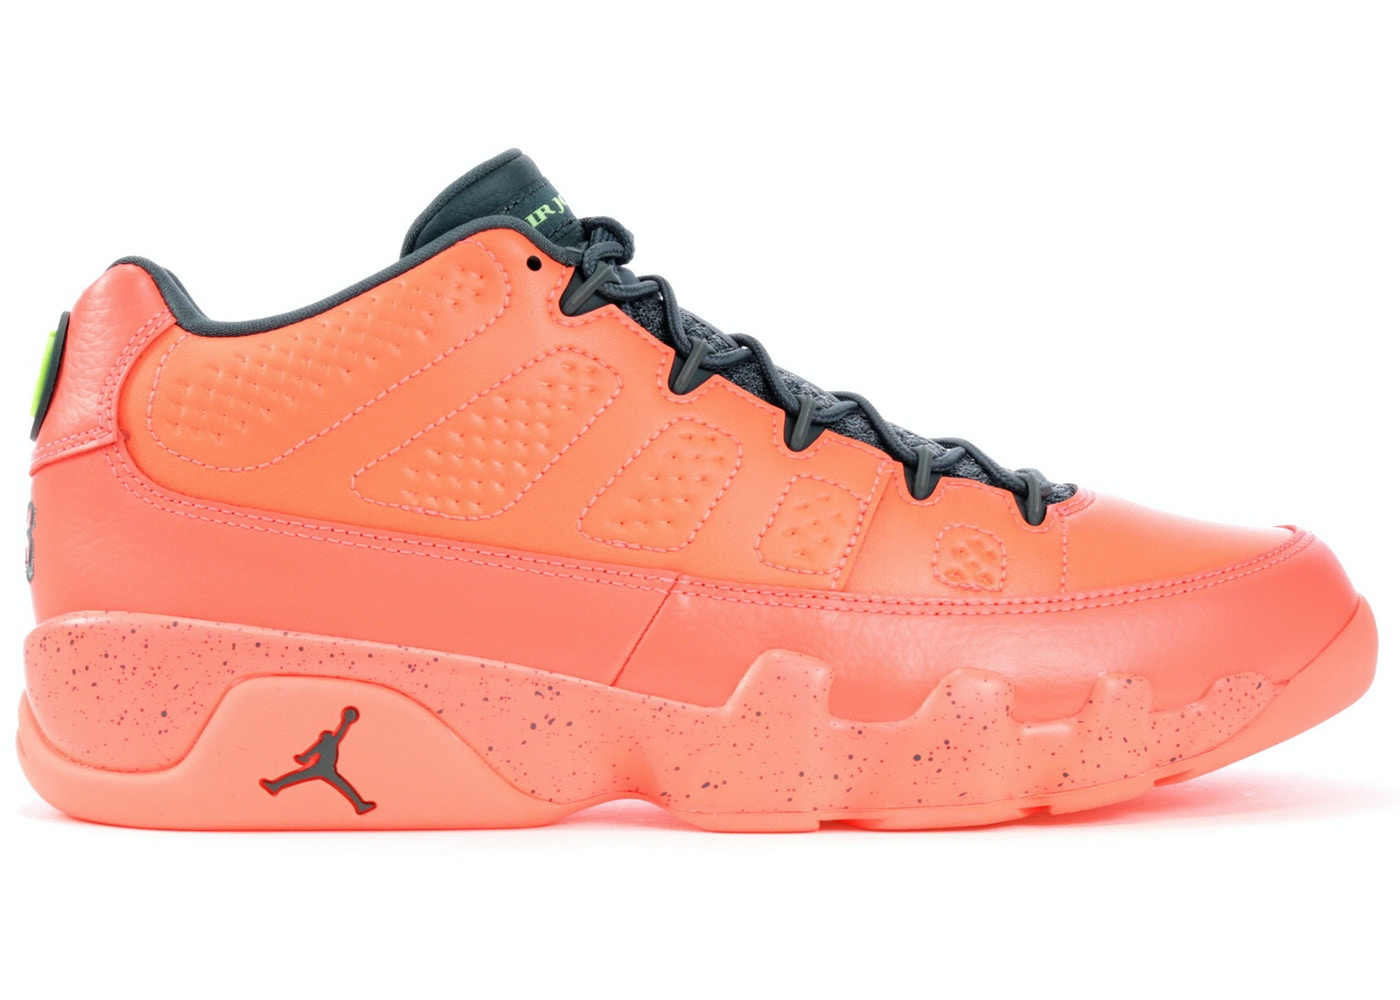 online store 21445 0768d Jordan 9 Retro Low Bright Mango